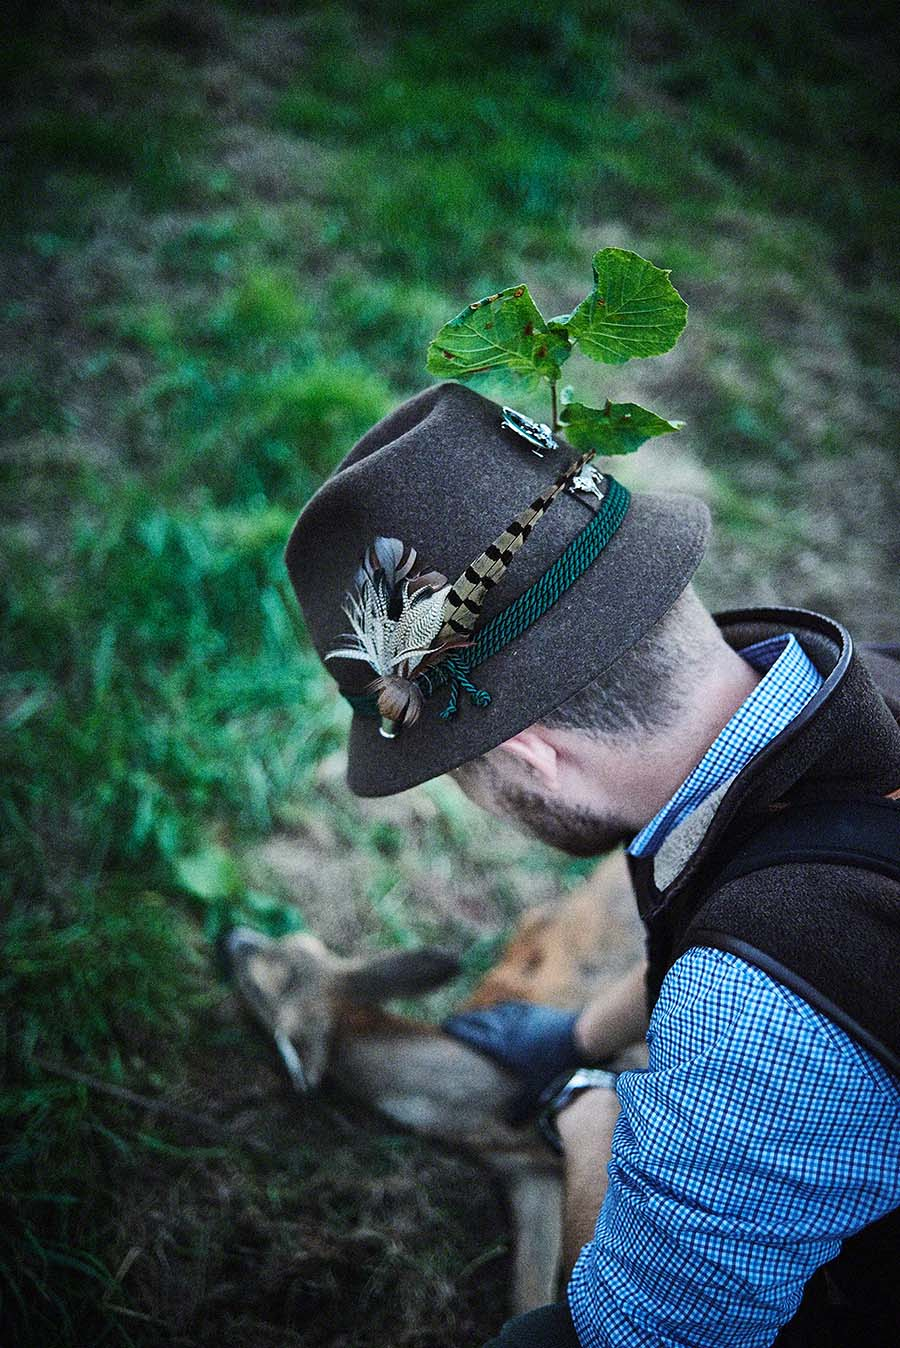 Jäger begutachtet geschossenes Wild - Jagd-Reportage mit Sternekoch Harald und Maximilian Rüssel Fotos: neon fotografie